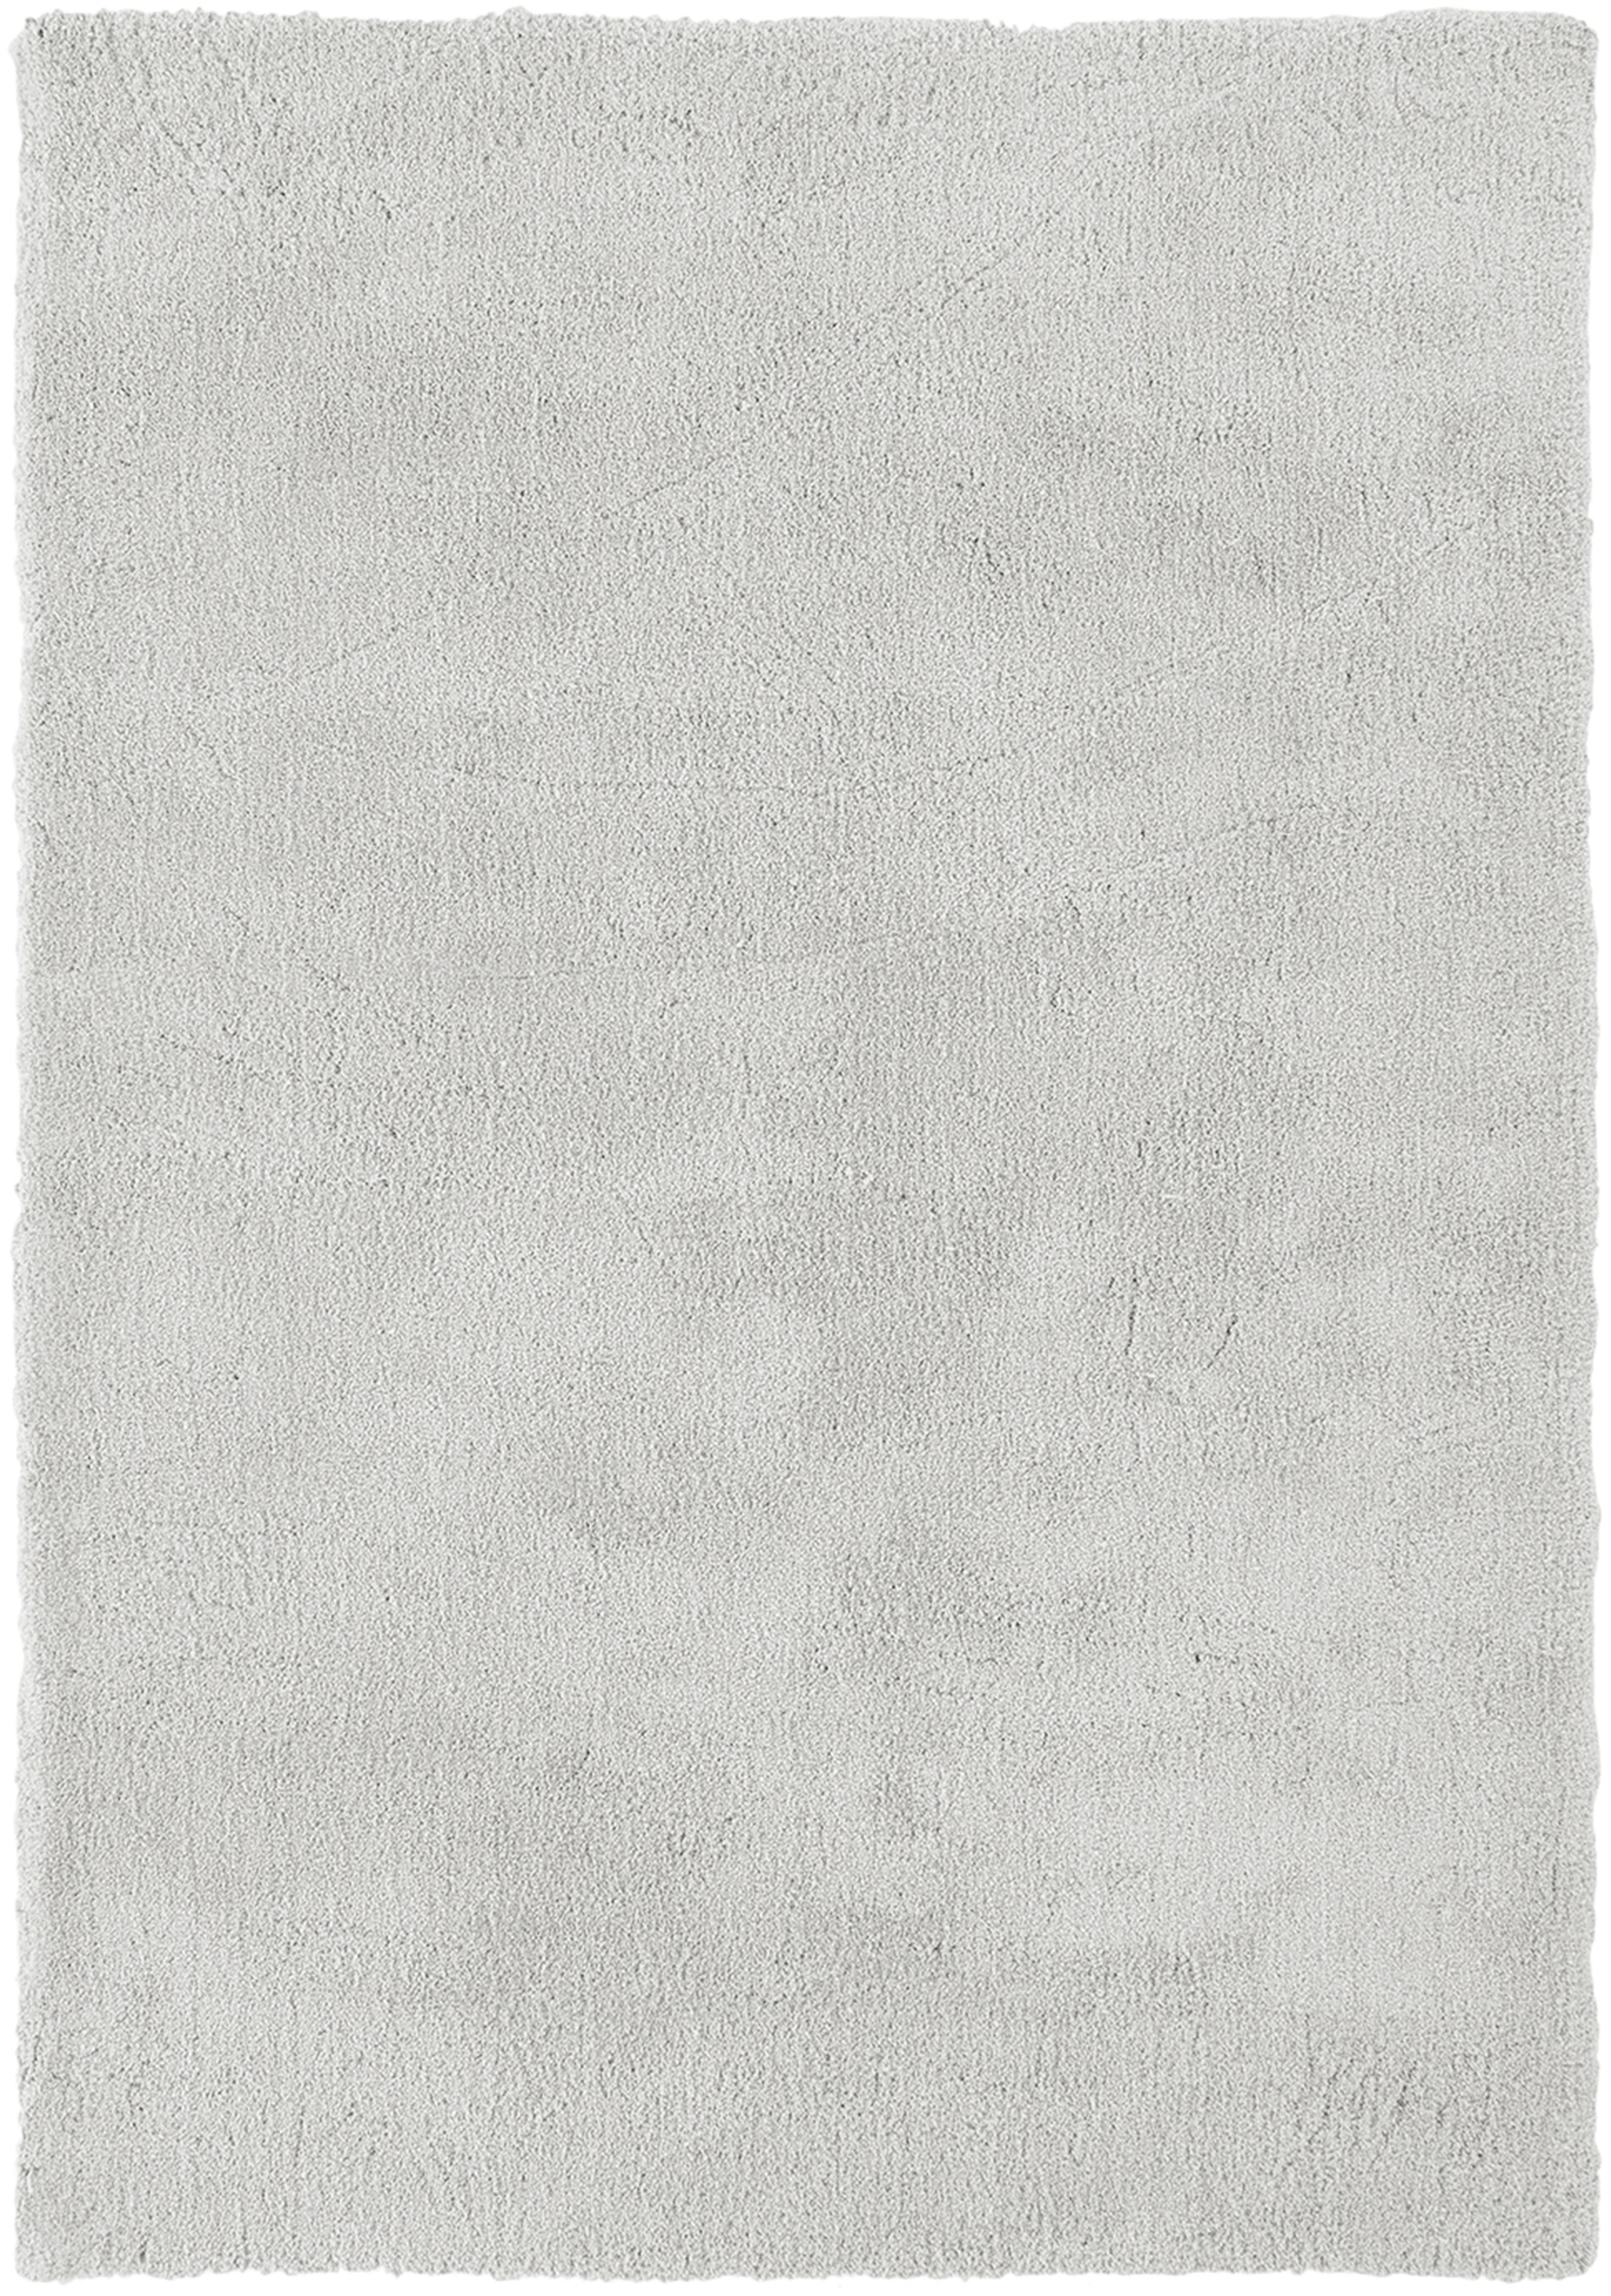 Flauschiger Hochflor-Teppich Leighton in Hellgrau, Flor: 100% Polyester (Mikrofase, Hellgrau, B 200 x L 300 cm (Grösse L)